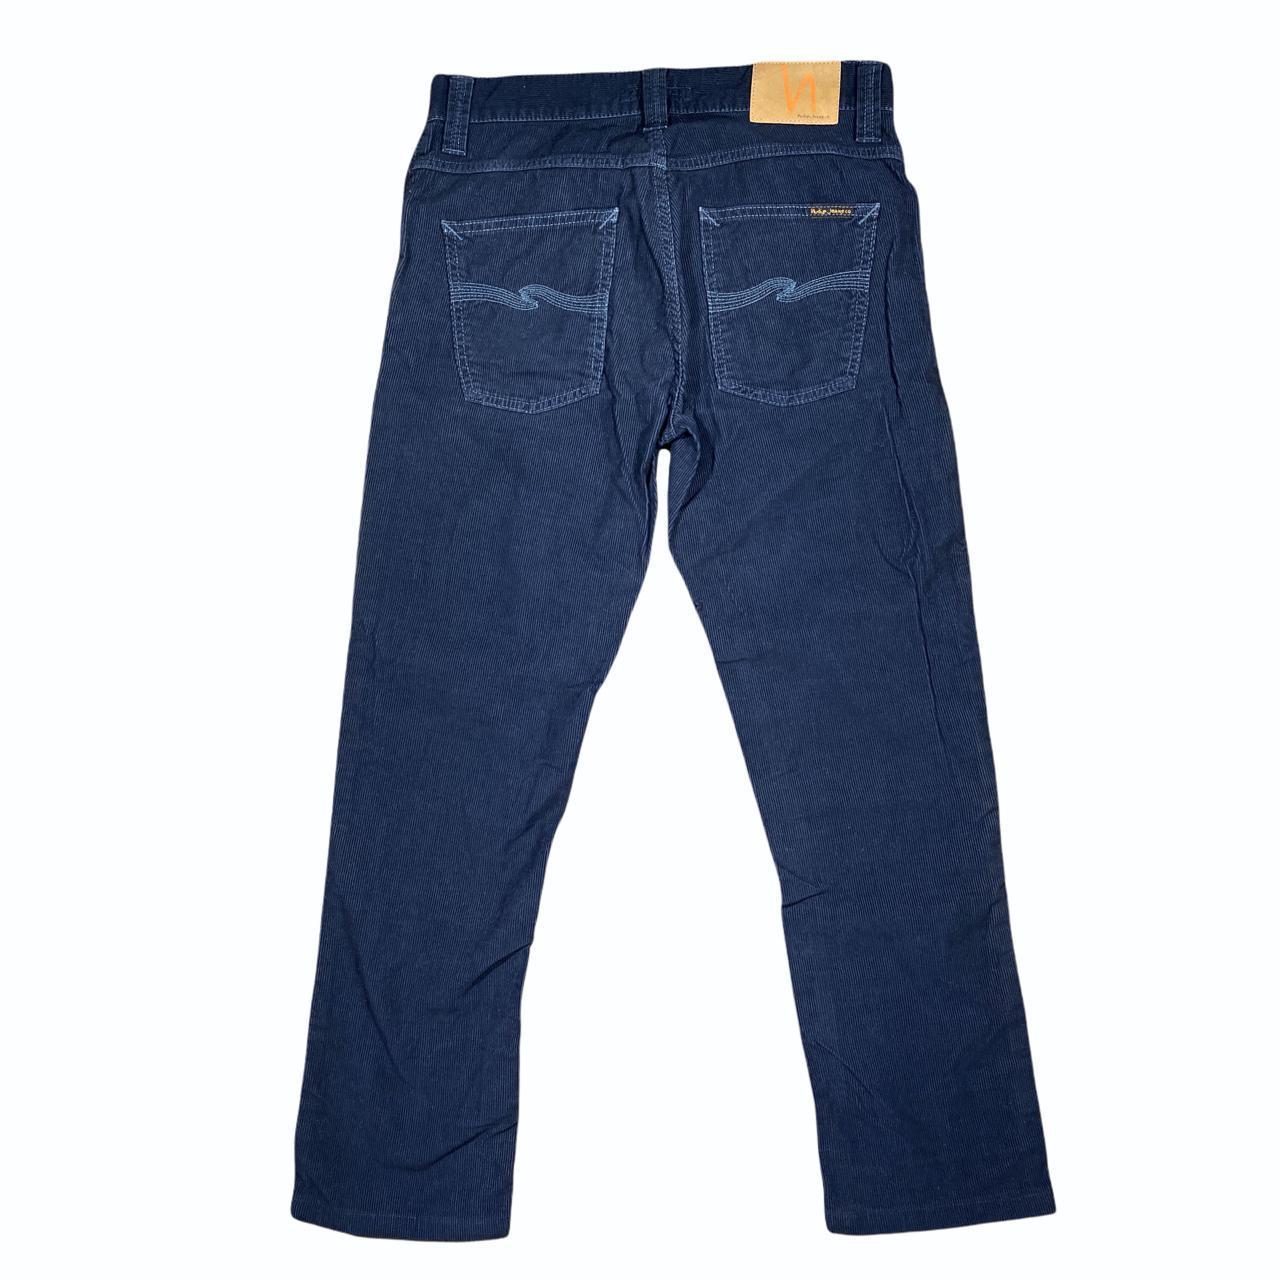 Product Image 1 - Nudie Jeans Grim Tim Organic